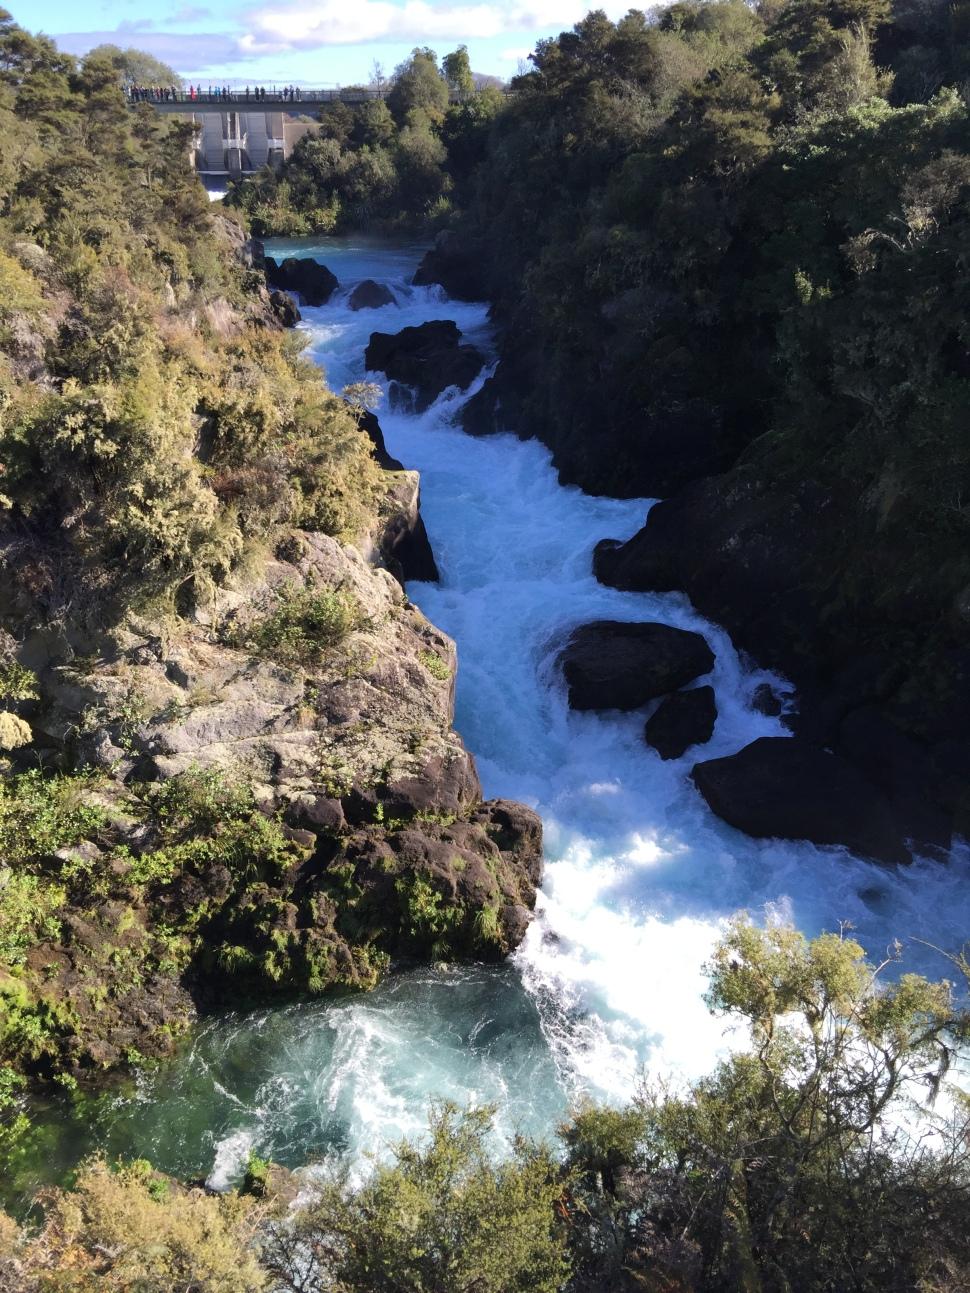 aratiatia rapids dam opening viewpoint